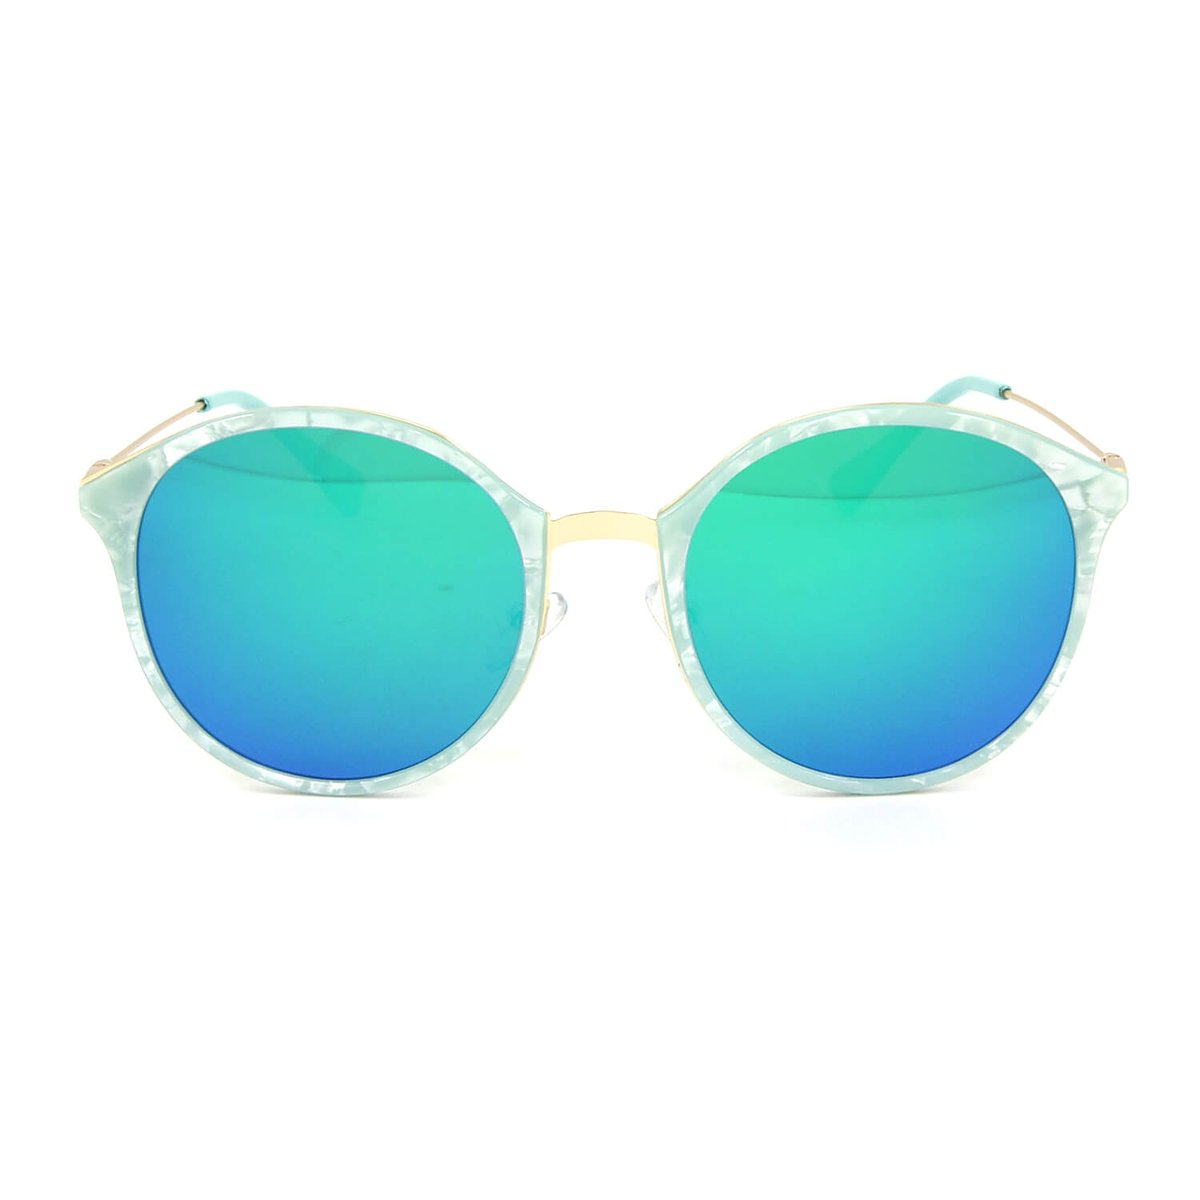 Óculos de Sol Marmorizado Redondo Lente Espelhada - Azul - Compre ... 58952b78b1